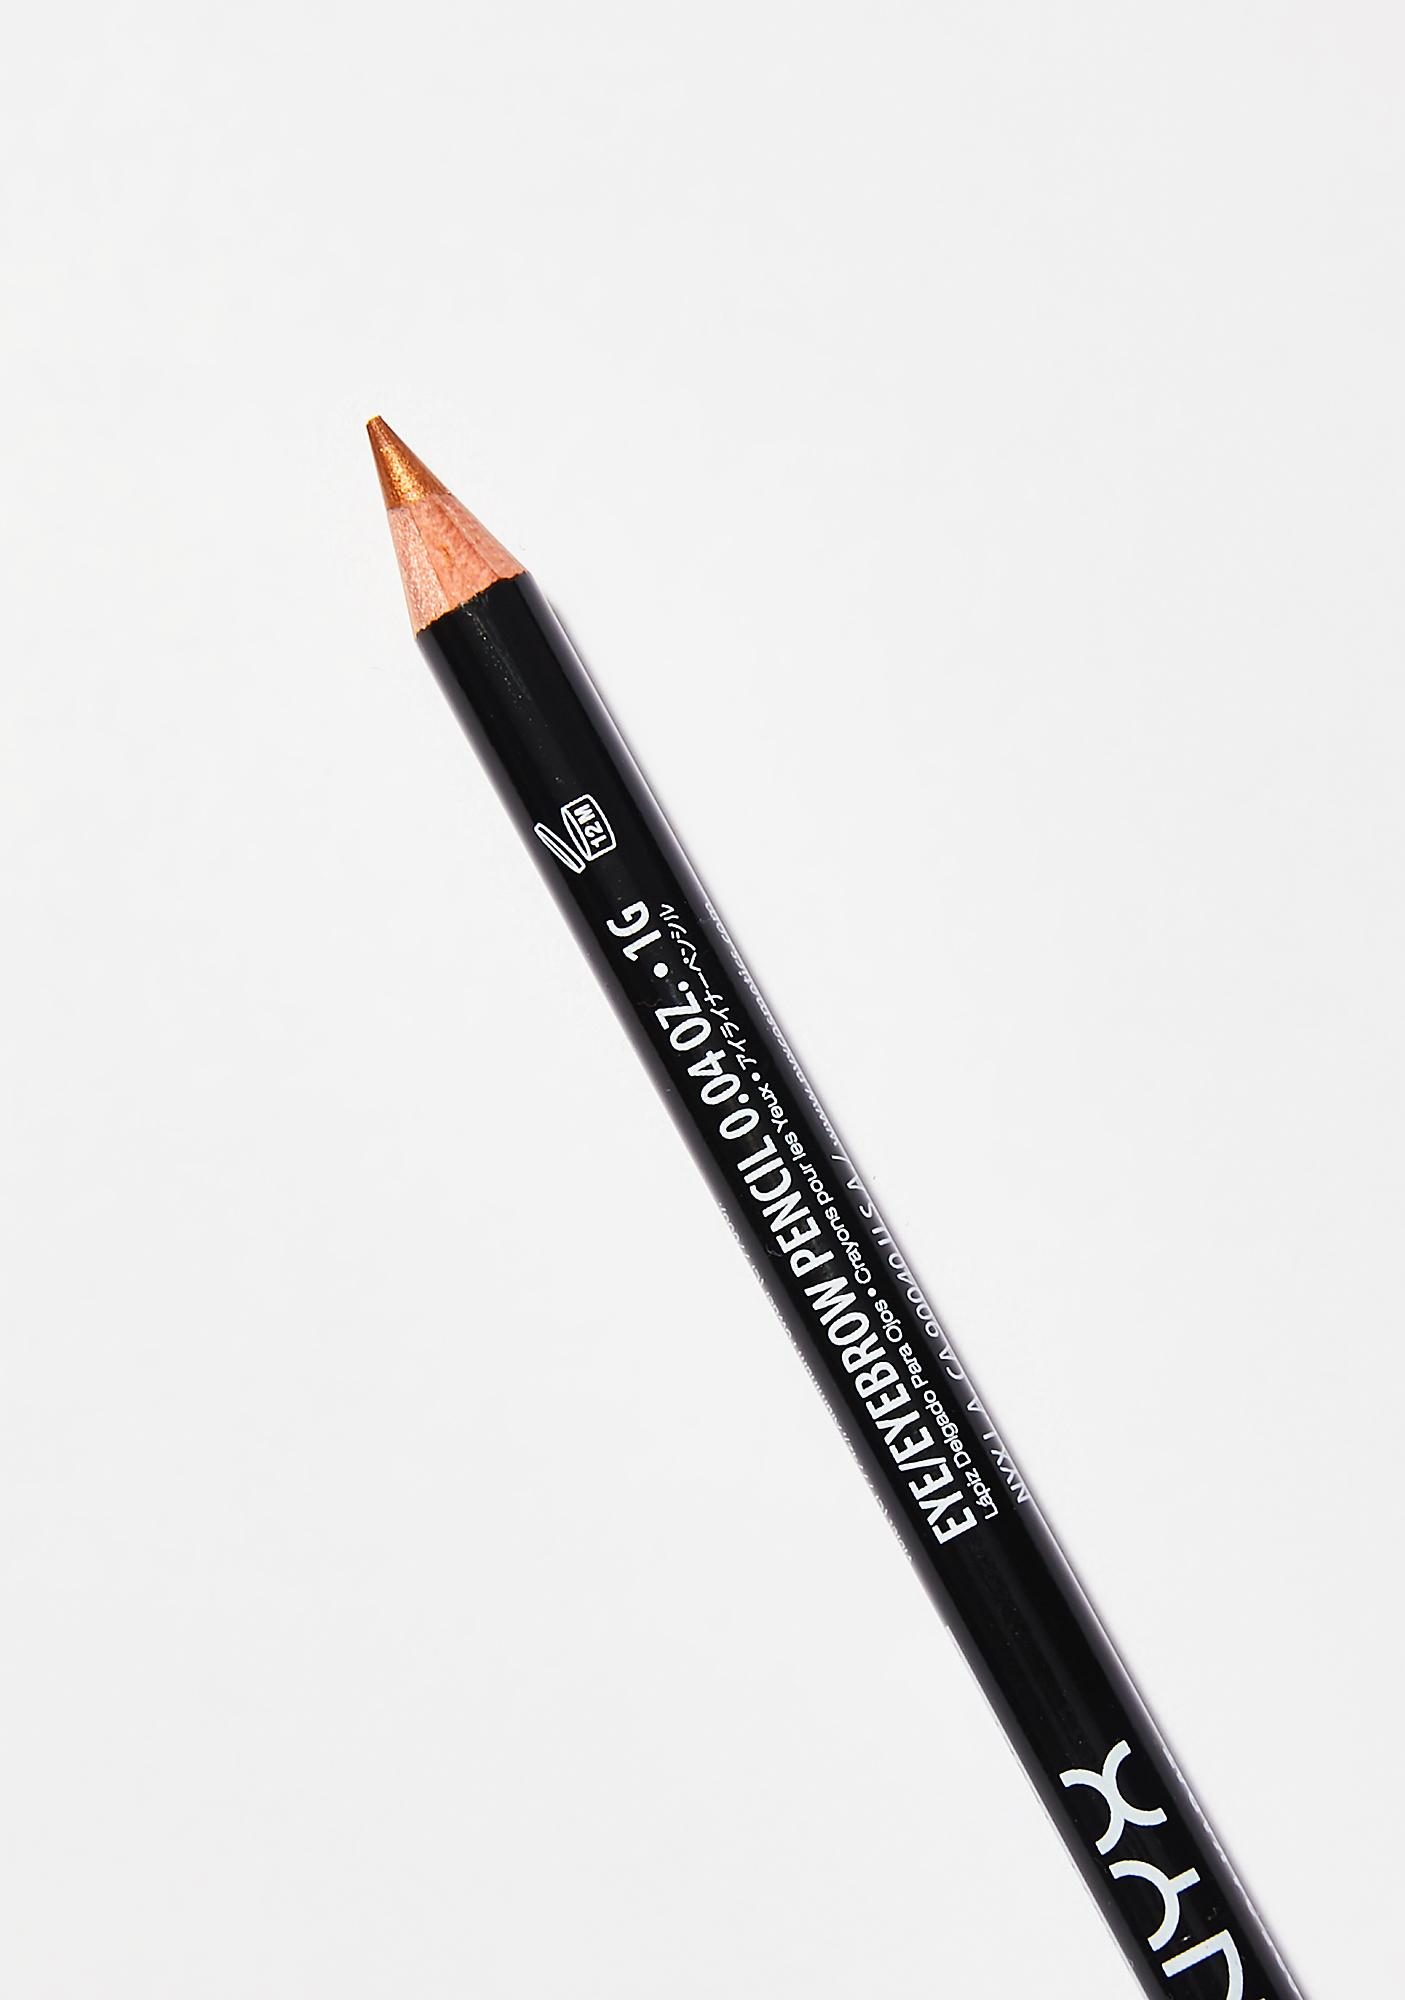 NYX 24 Karat Eye/Eyebrow Pencil